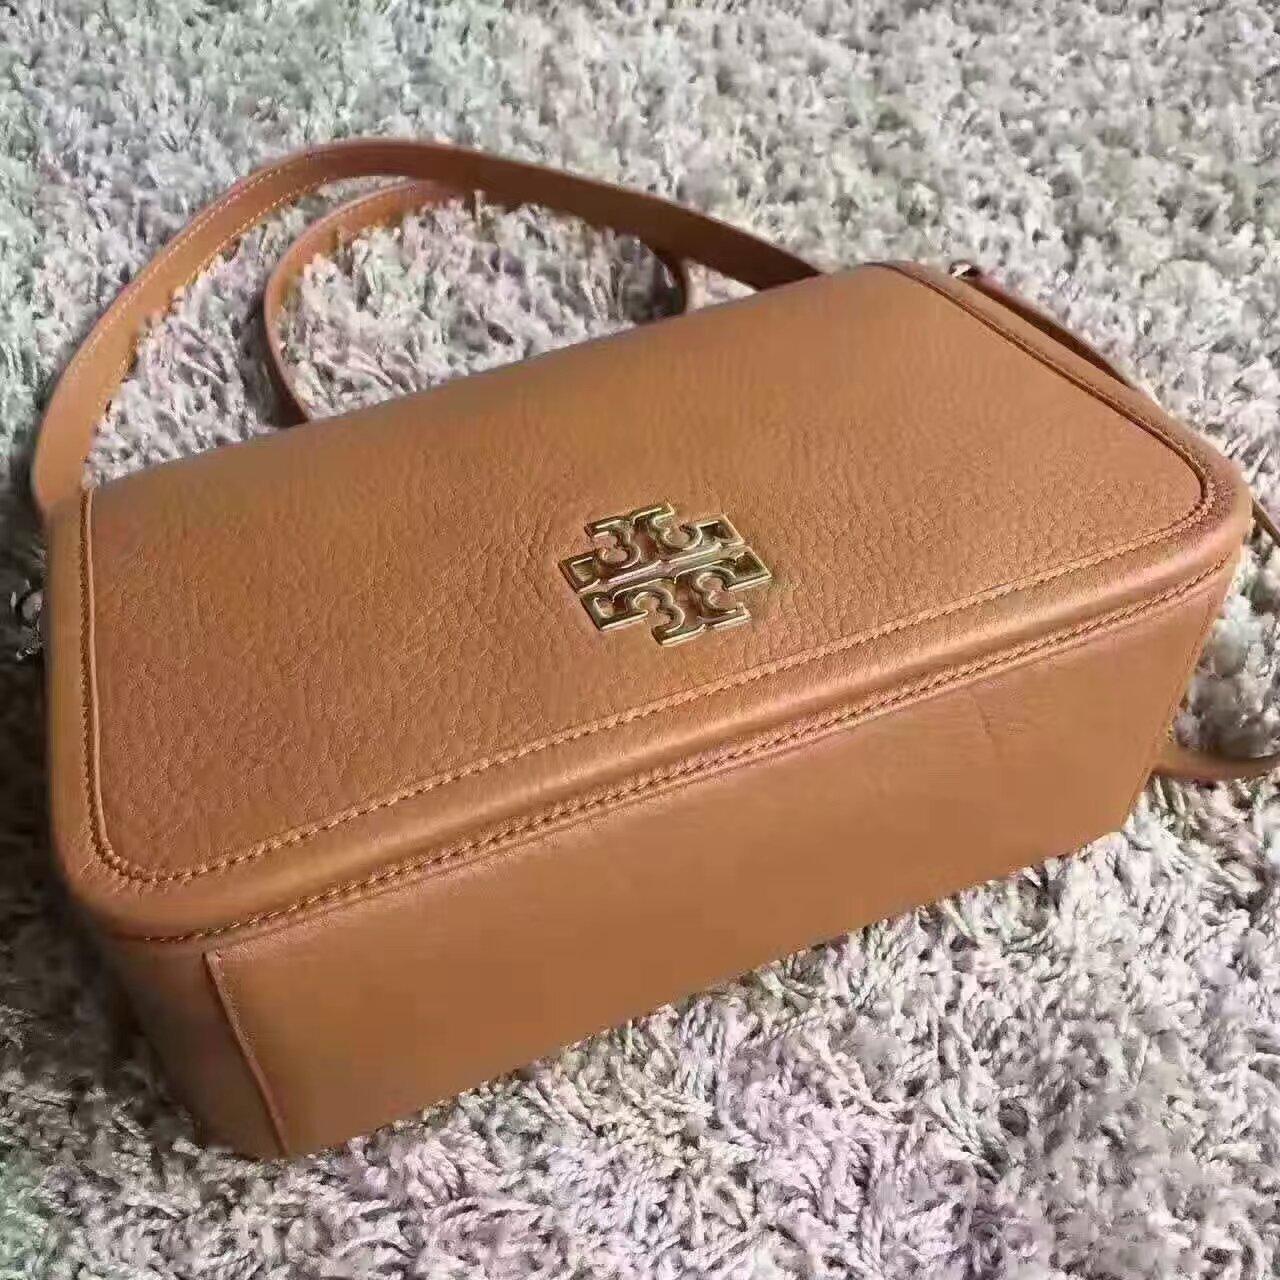 75c6f5e2dd7e NWT Tory Burch Britten Shoulder Bag and 50 similar items